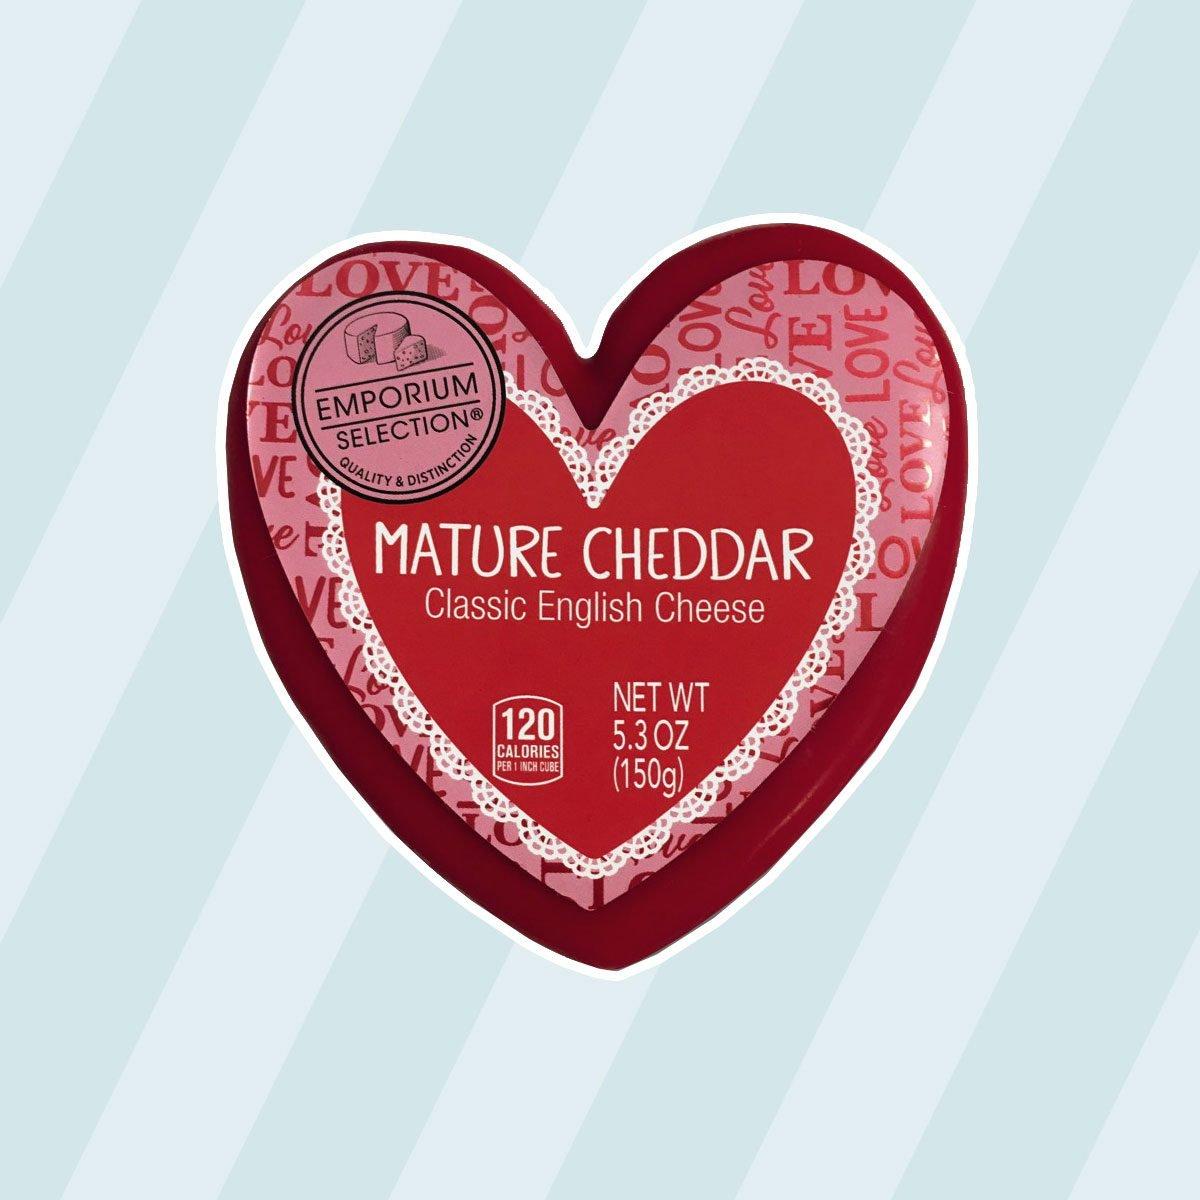 Emporium Selection Valentine's Day Cheese Assortment aldi finds